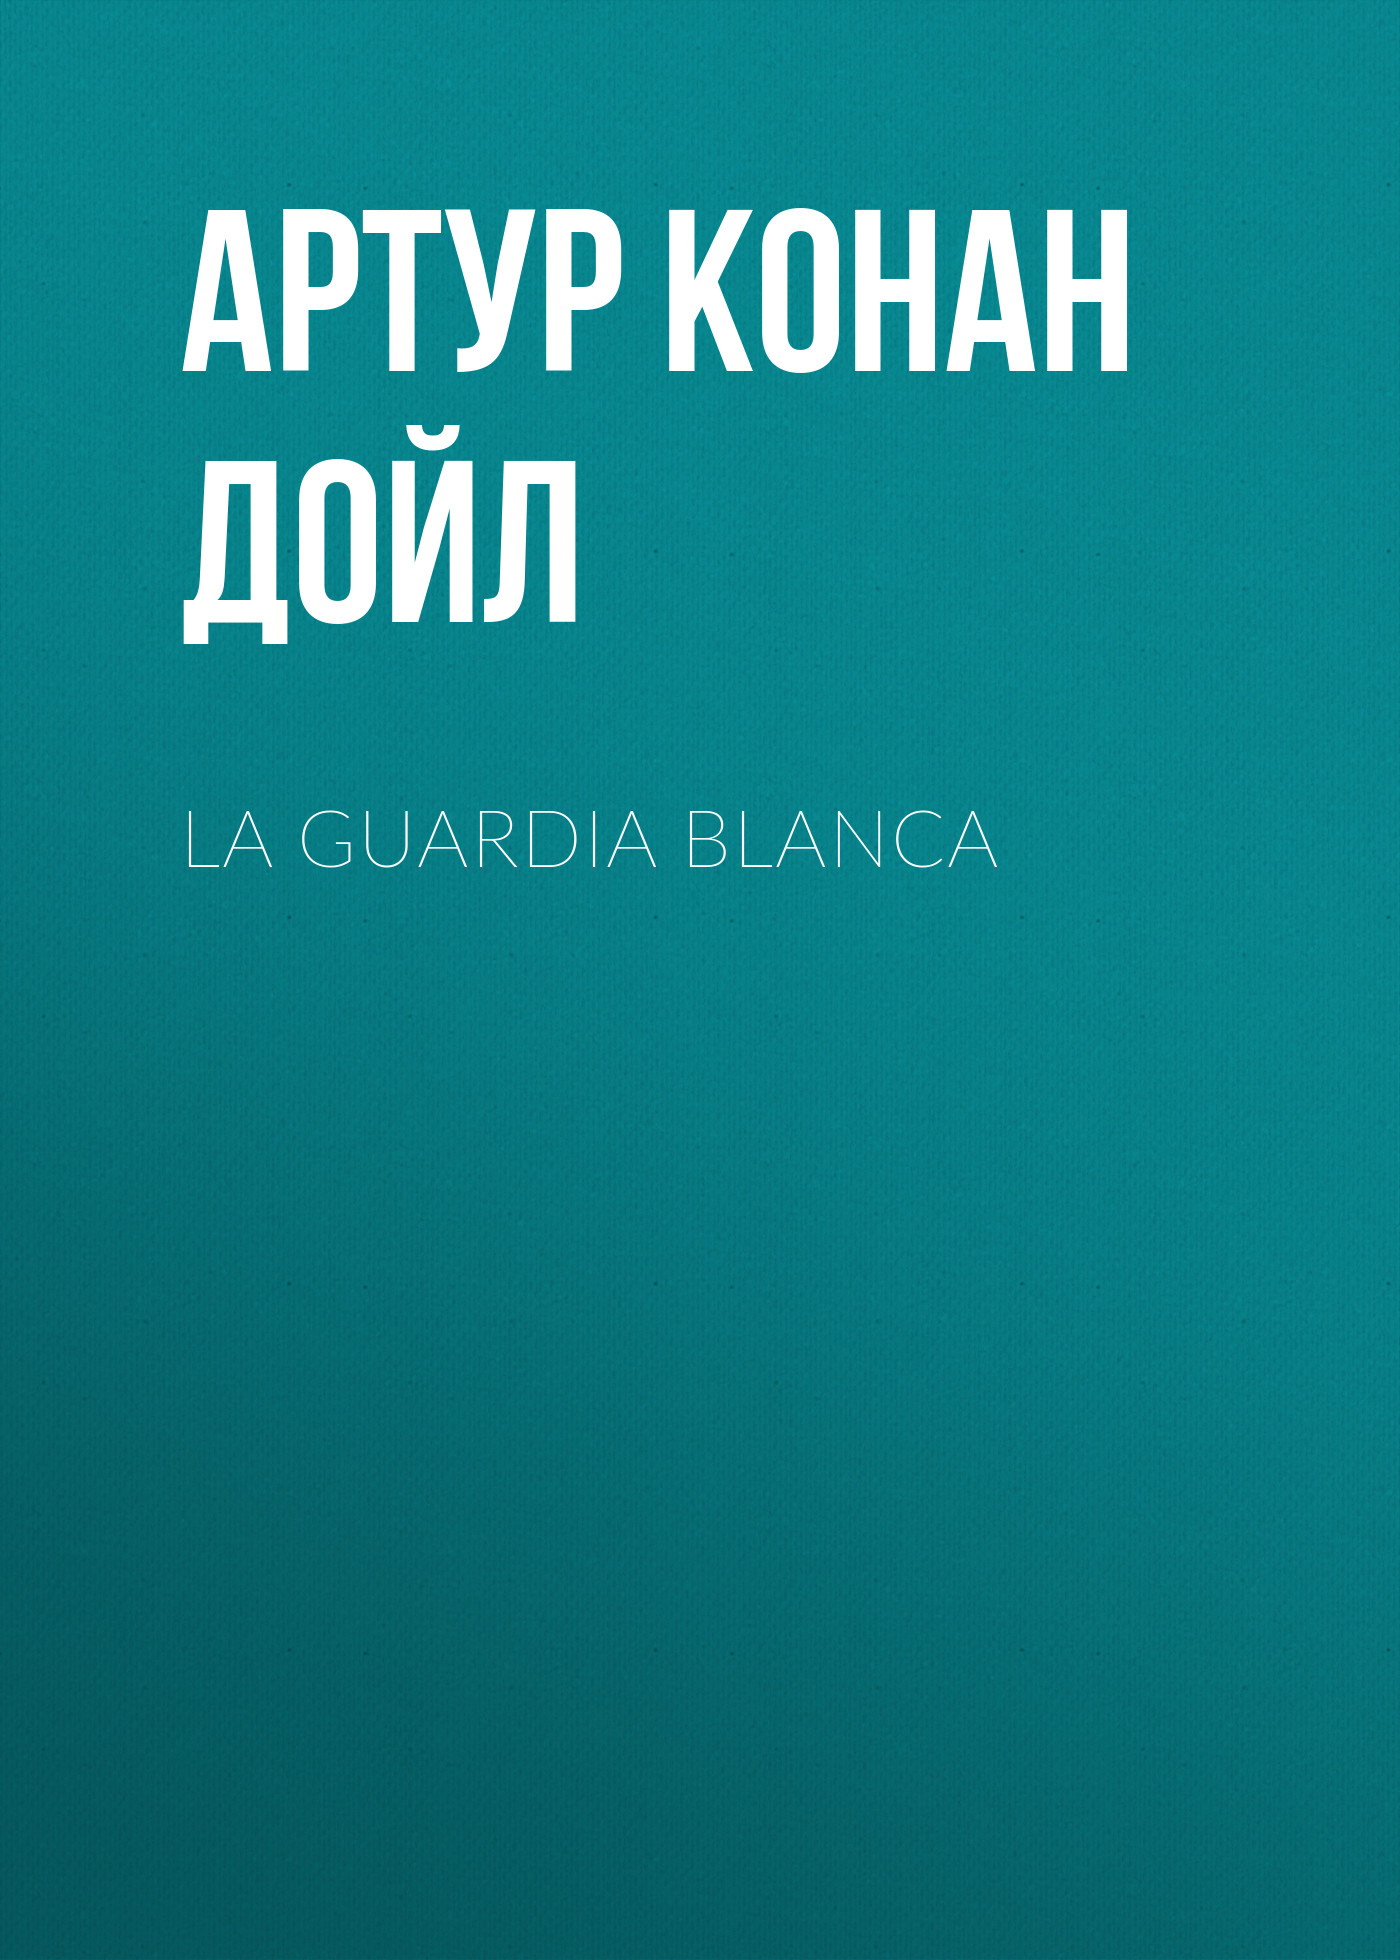 Артур Конан Дойл La guardia blanca артур конан дойл артур конан дойл собрание сочинений комплект из 8 книг